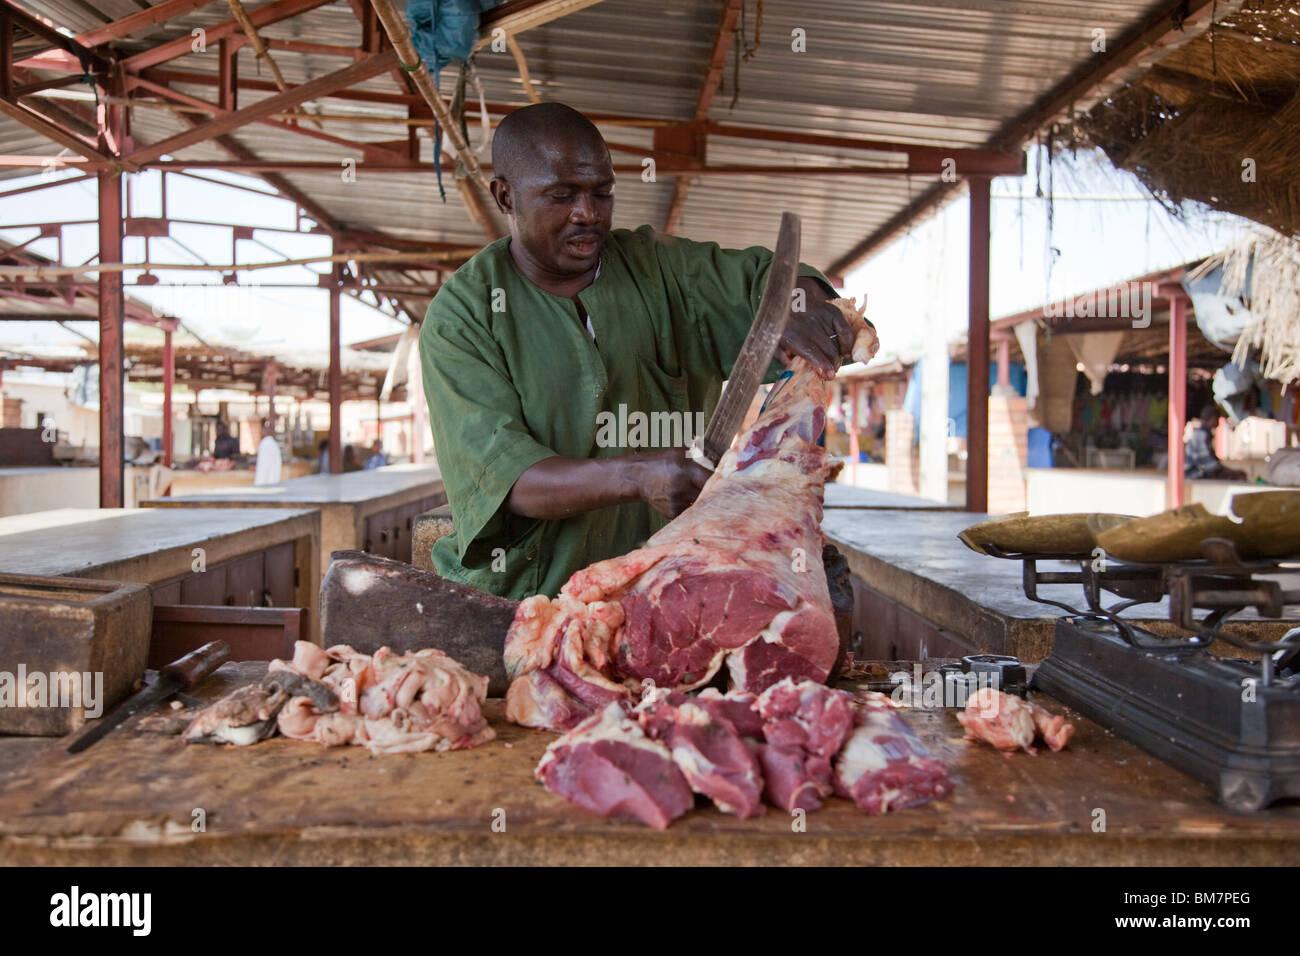 A butcher cuts meat in the market in Segou, Mali. - Stock Image